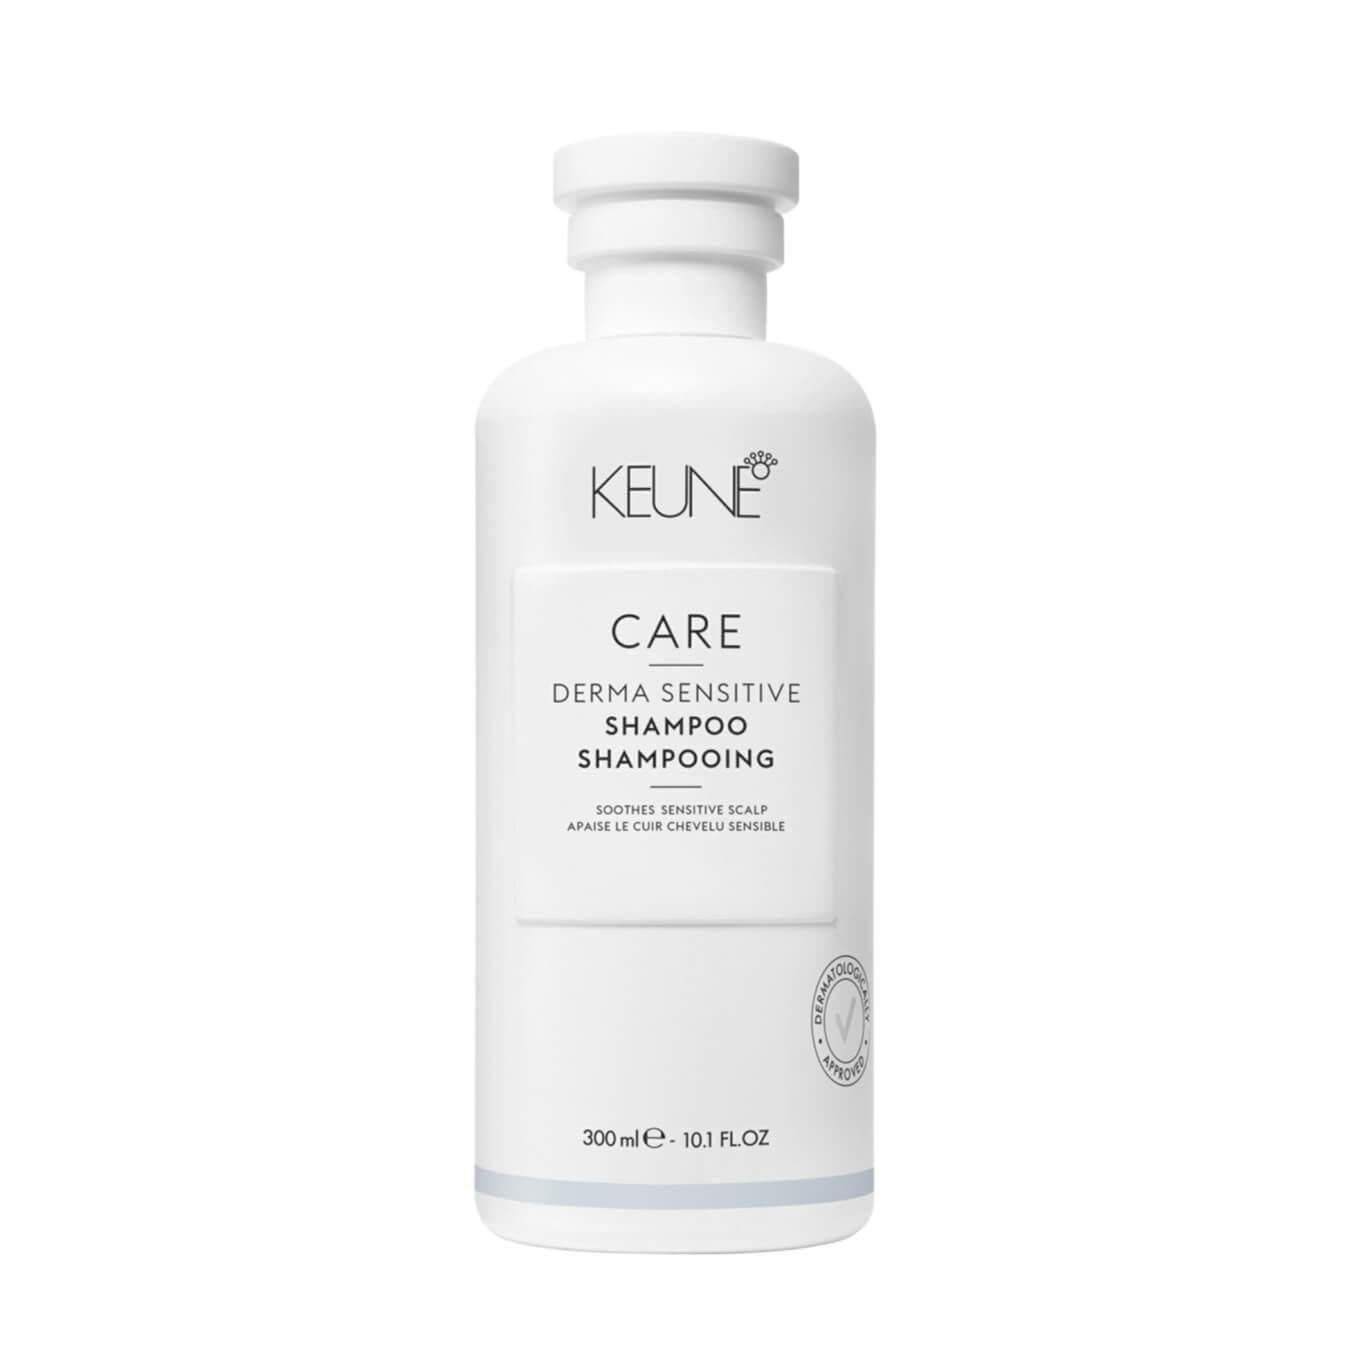 Kauf Keune Care Derma Sensitive Shampoo 300ml